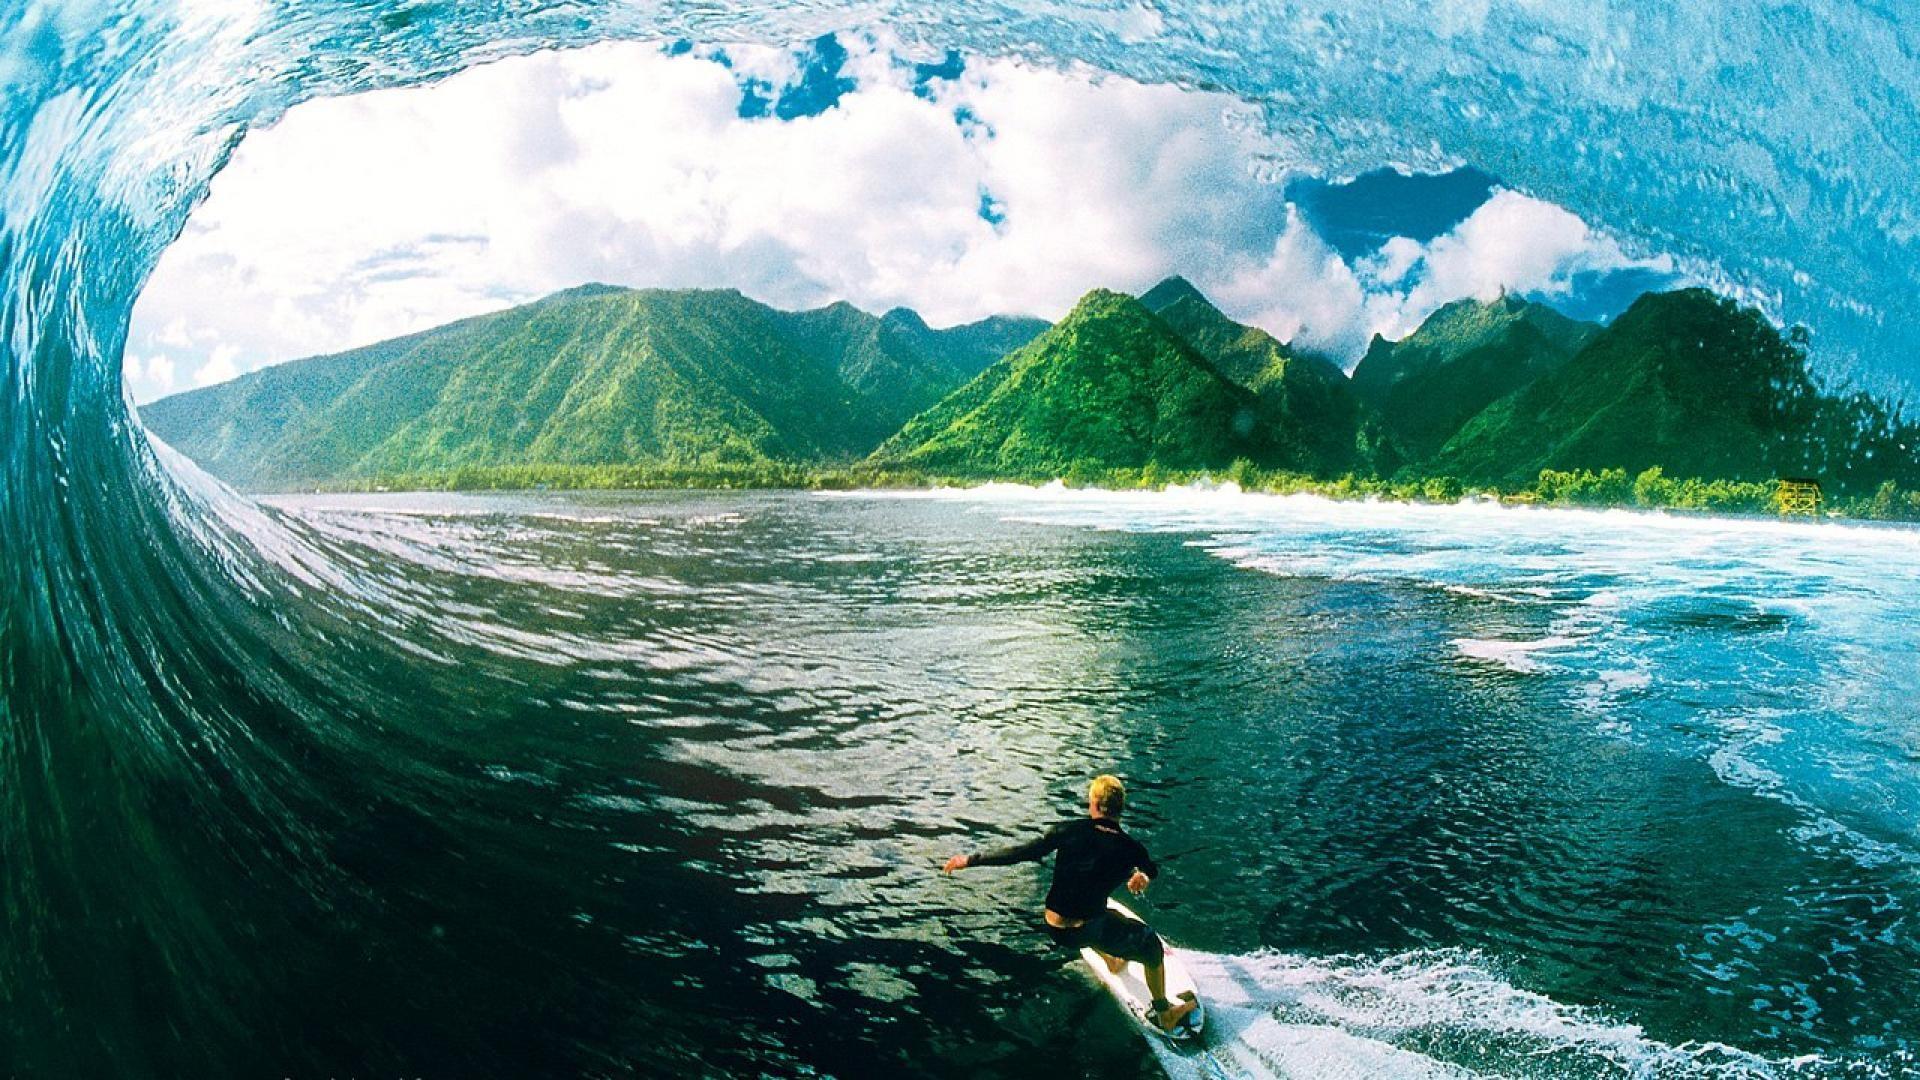 Surfing Wallpaper Image Wallpaper